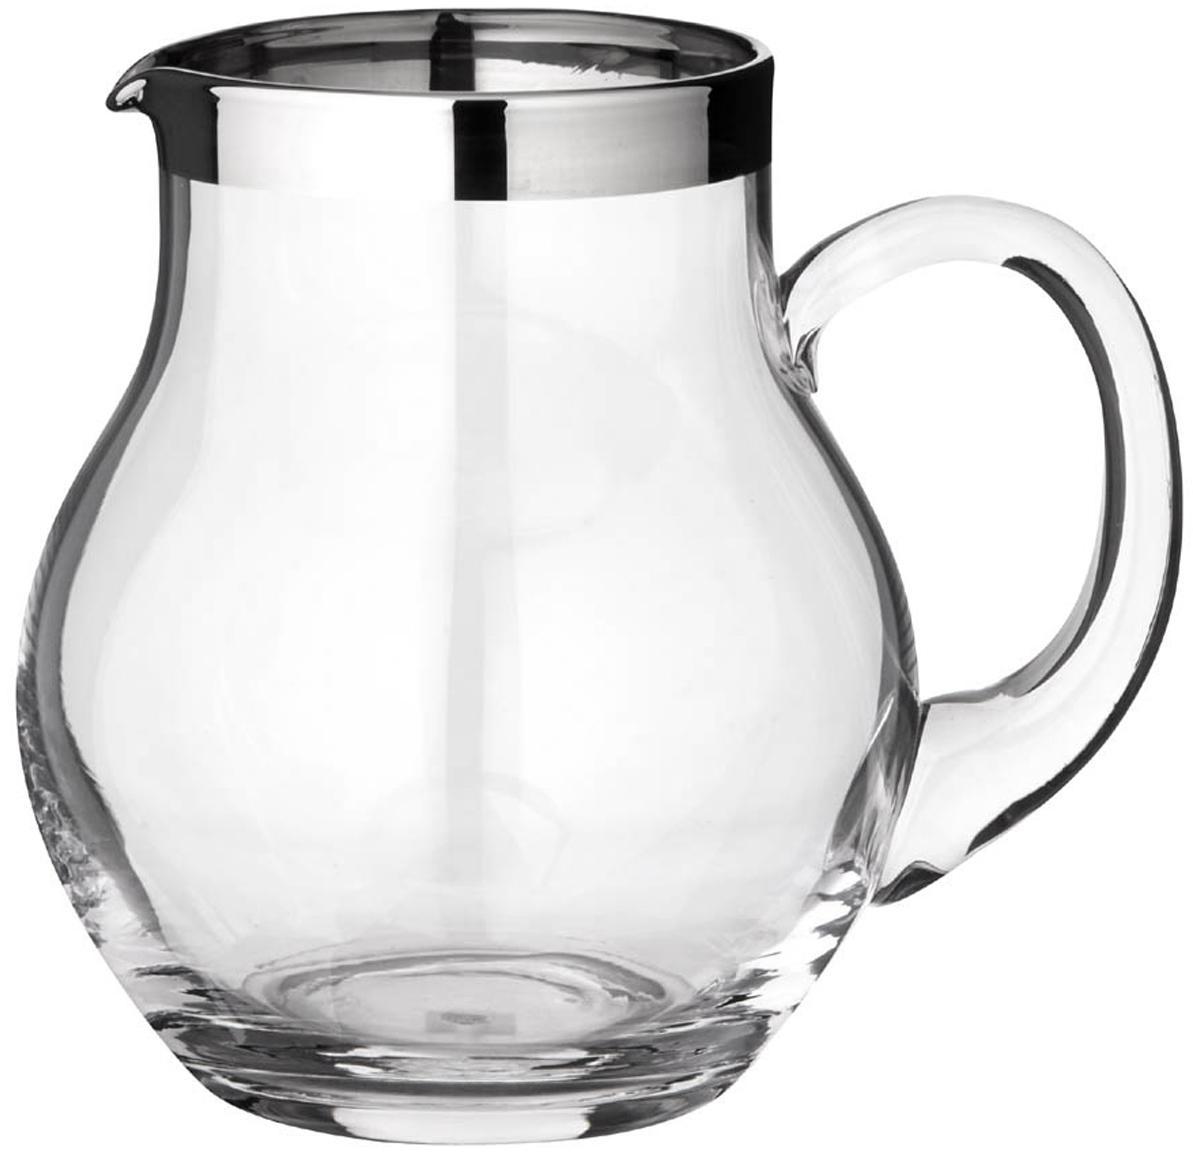 Krug Olivia, Kristallglas , Platinrand, Transparent, 1 L